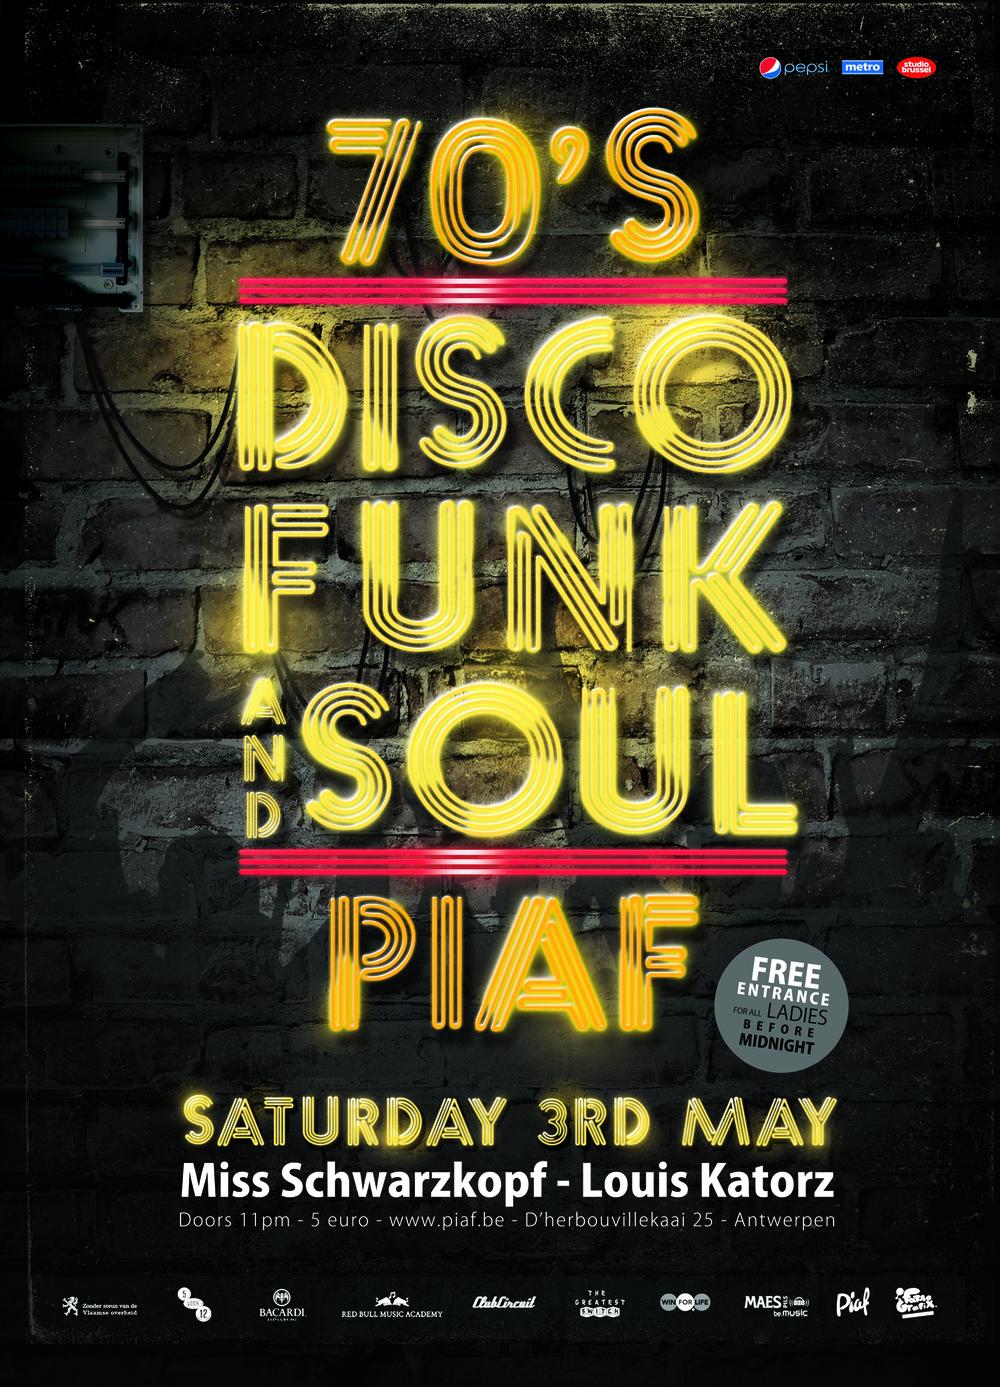 Disco Funk and Soul